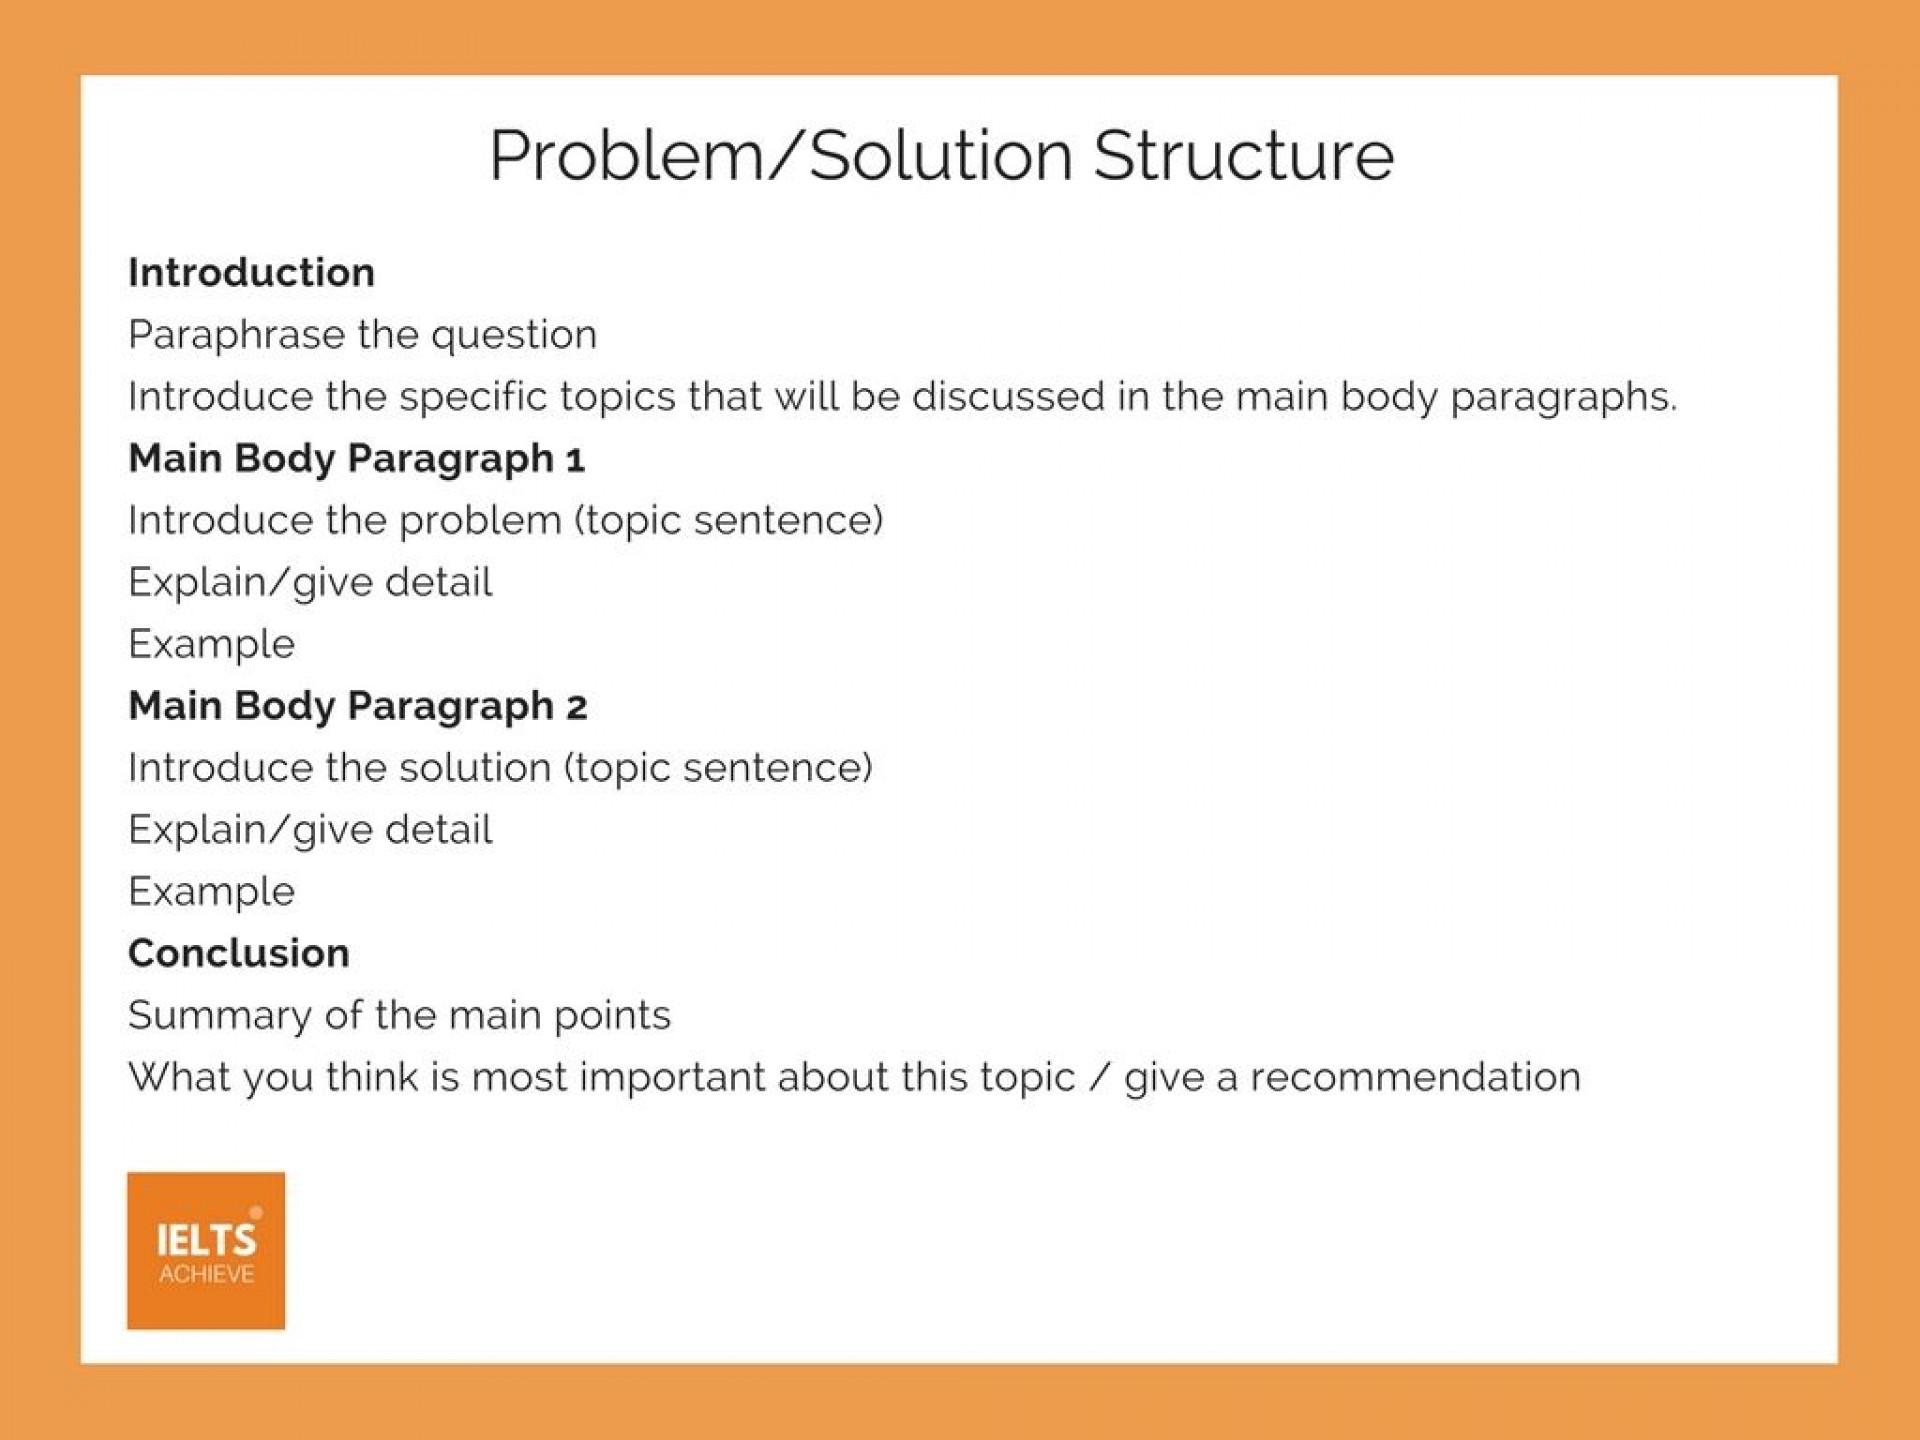 001 Problem Solution Essay Formidable Structure Pdf Format Ielts Layout 1920